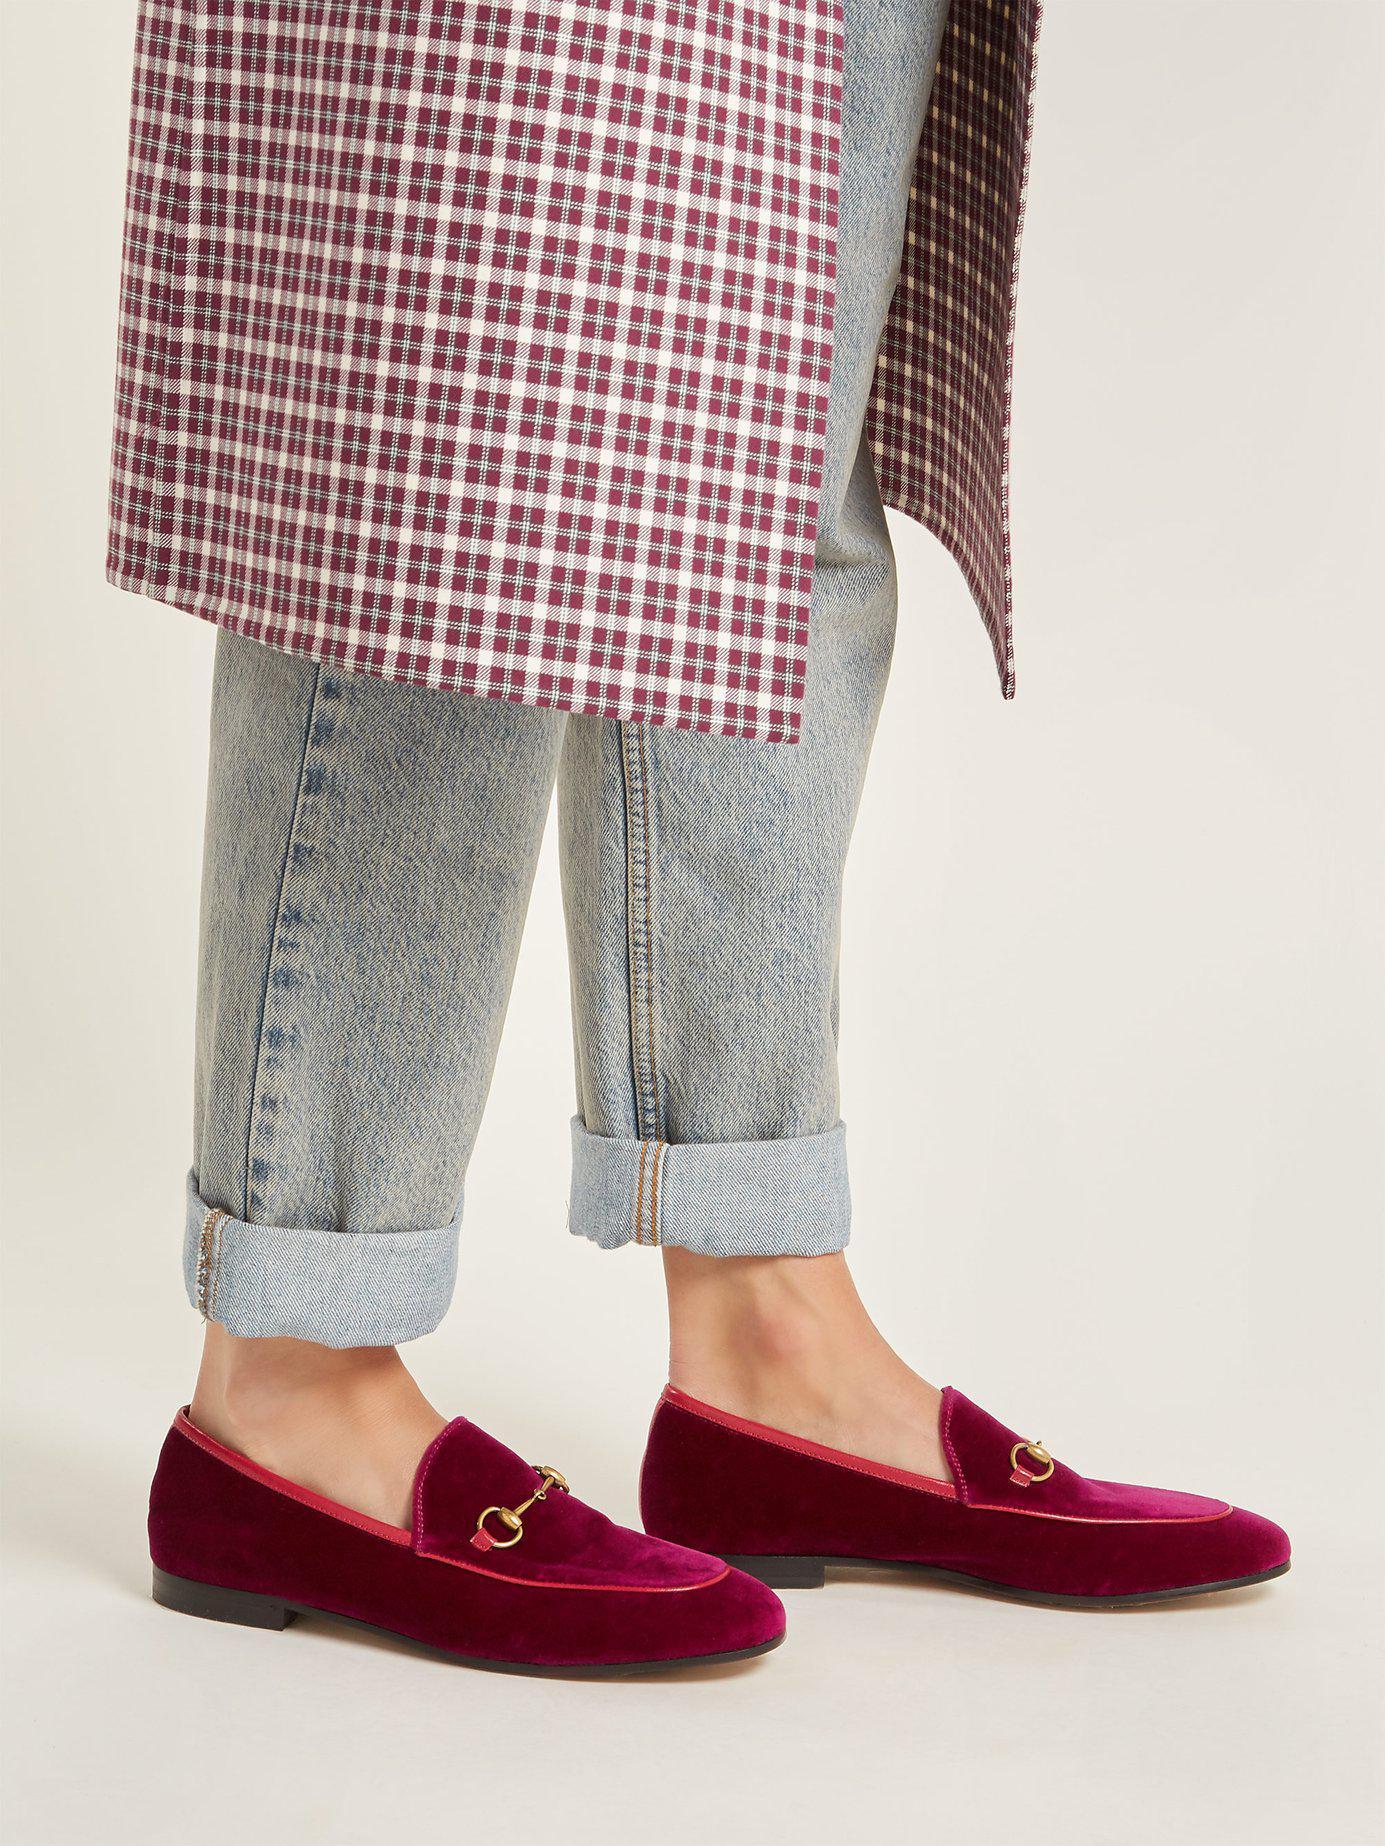 pink velvet gucci loafers